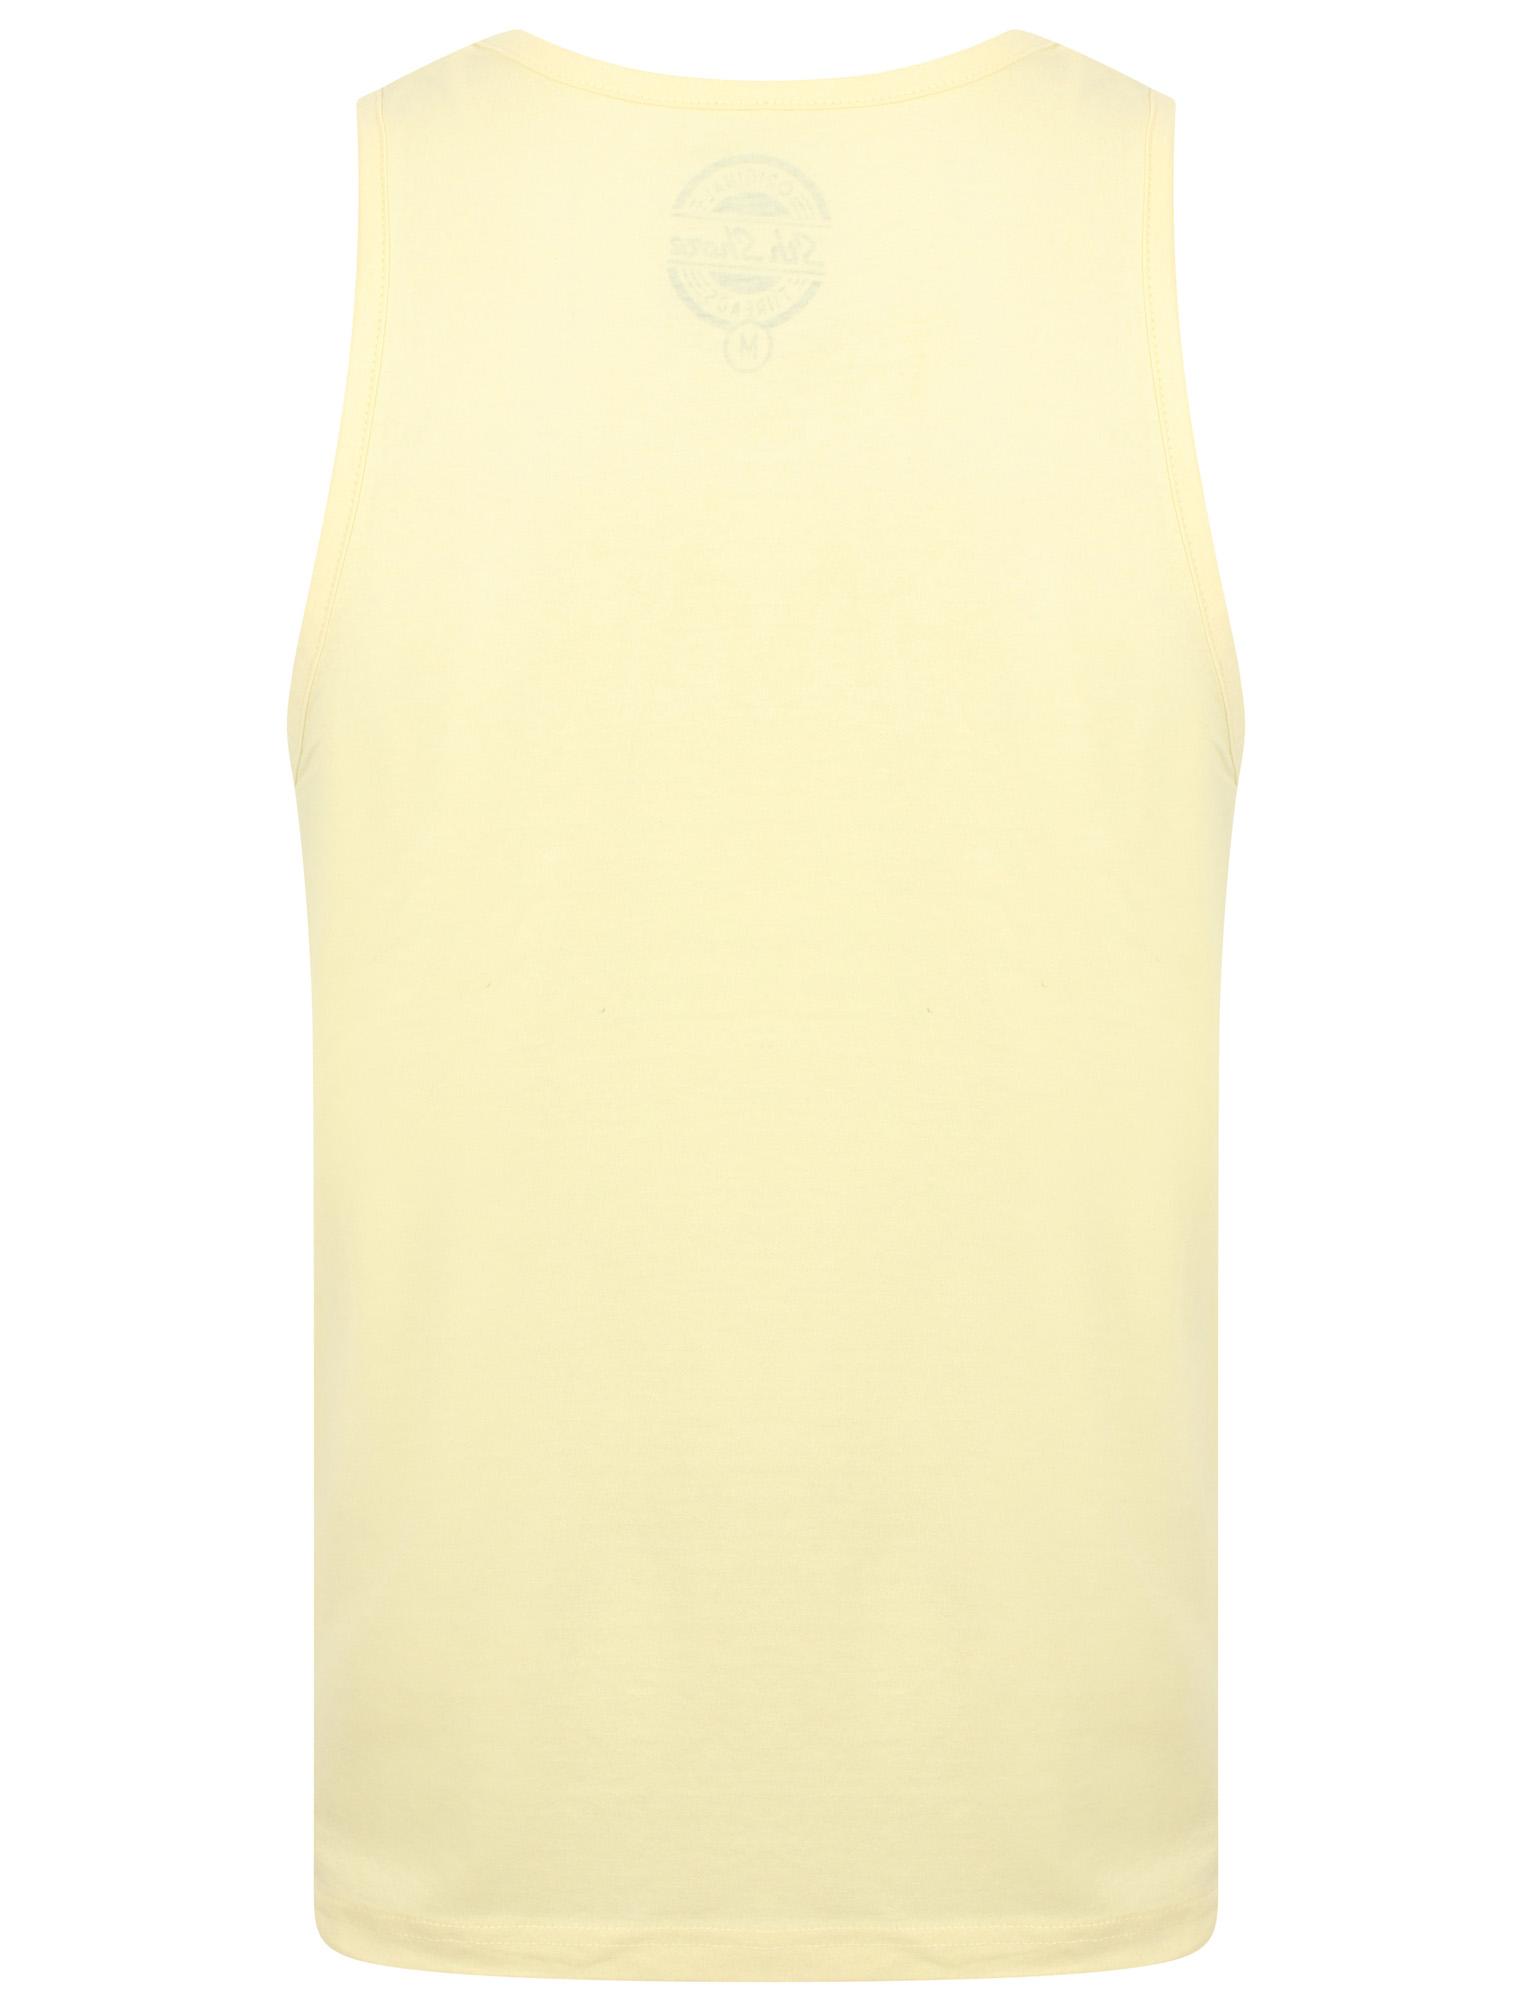 New Mens South Shore Just Escaping Cotton Rich Graphic Print Vest Top Size S-XXL